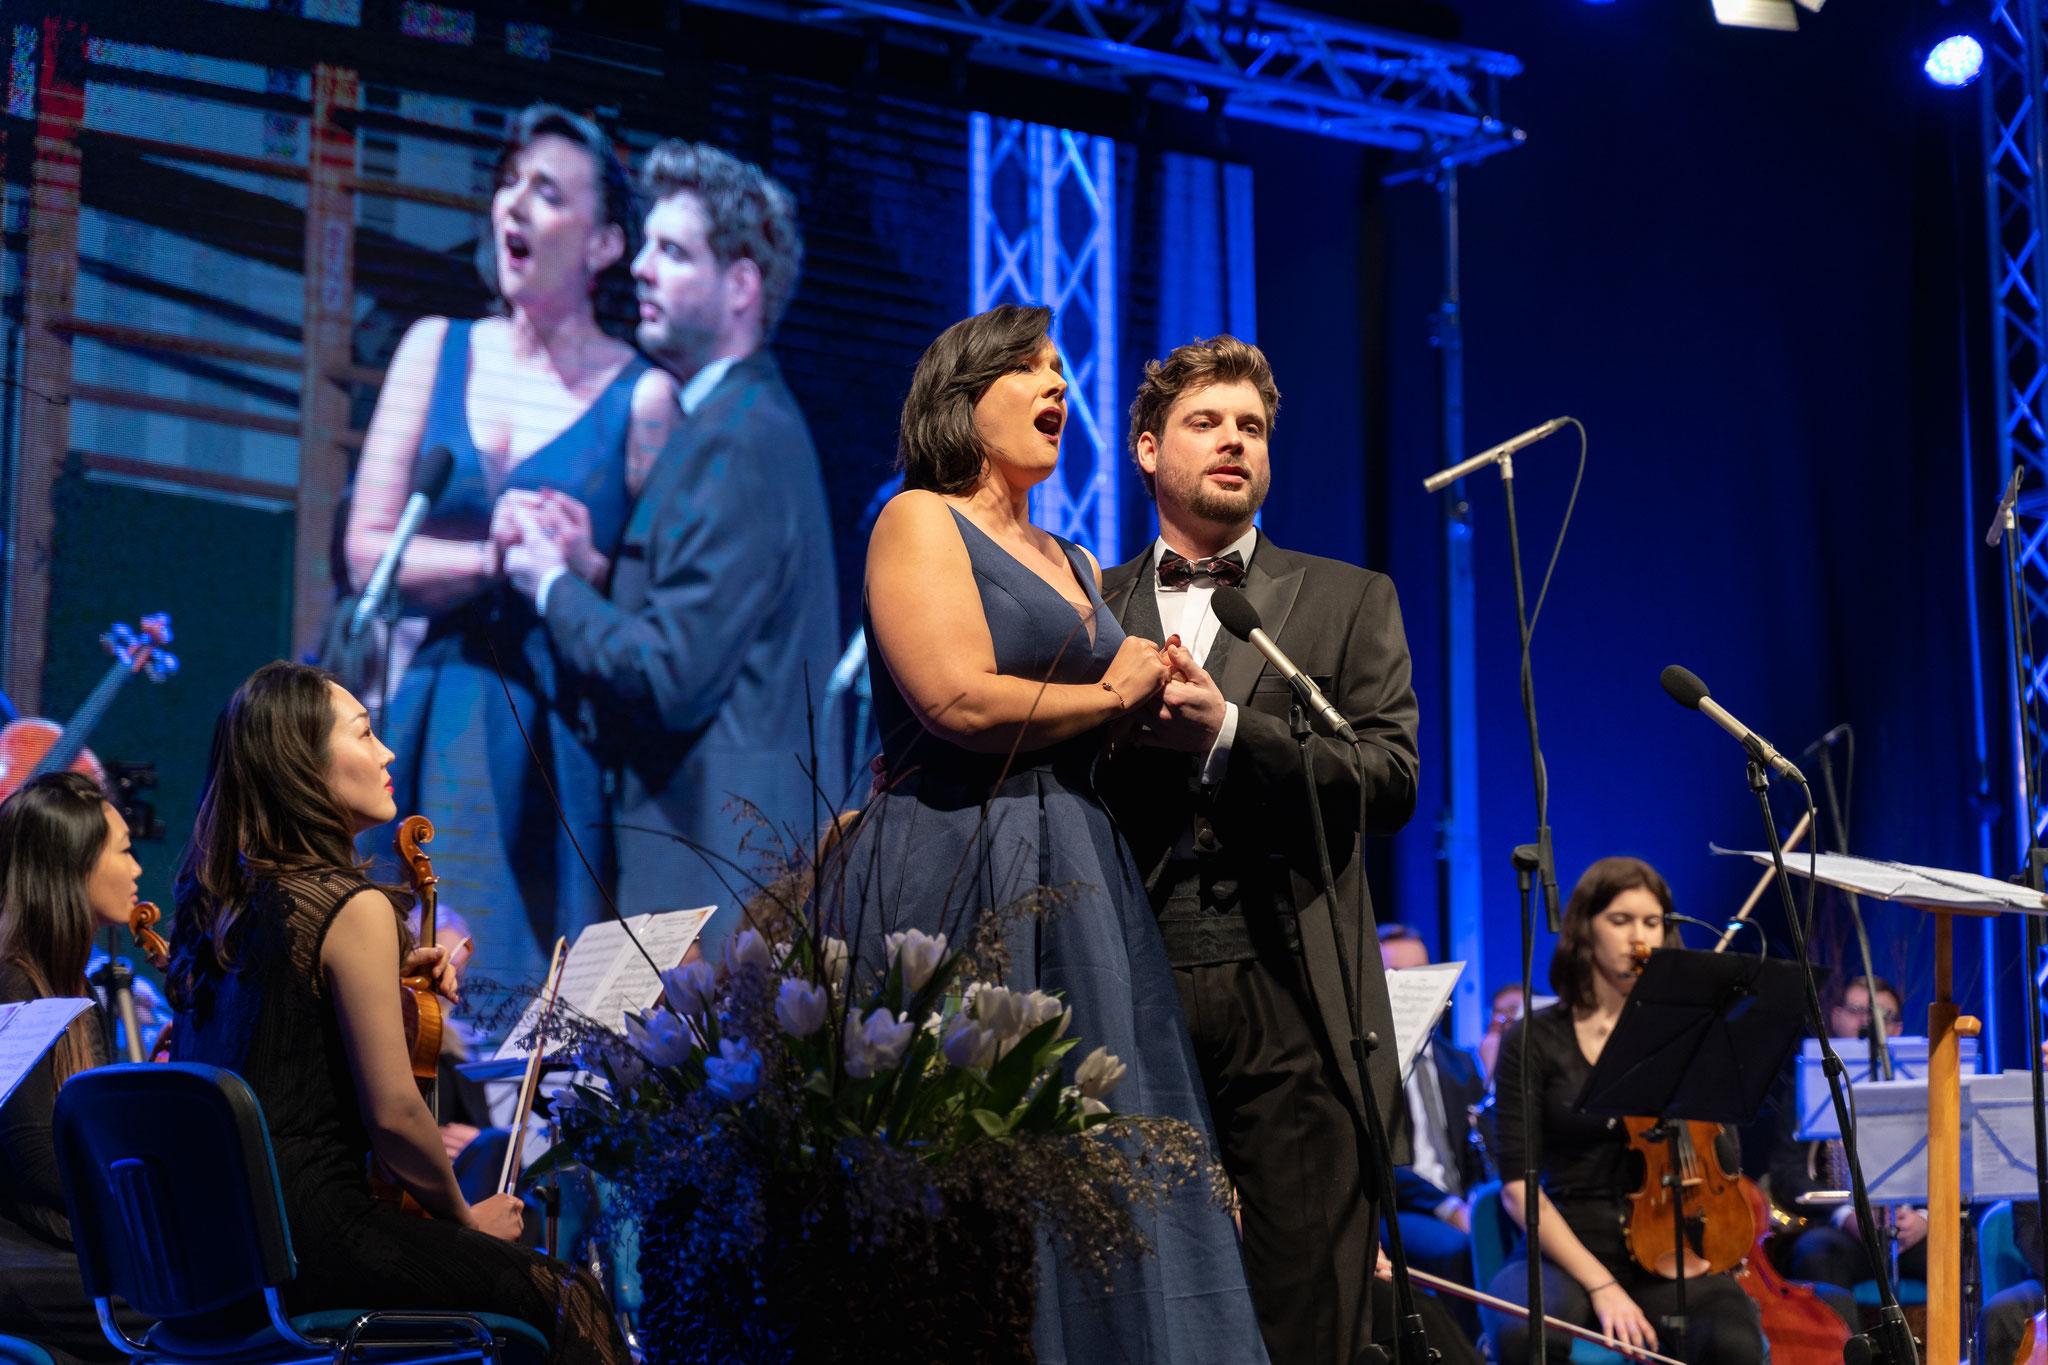 2019 / Concert ALJAŽ and ANDREJ VESEL and the Symphony Orchestra Ton der Jungend Vienna